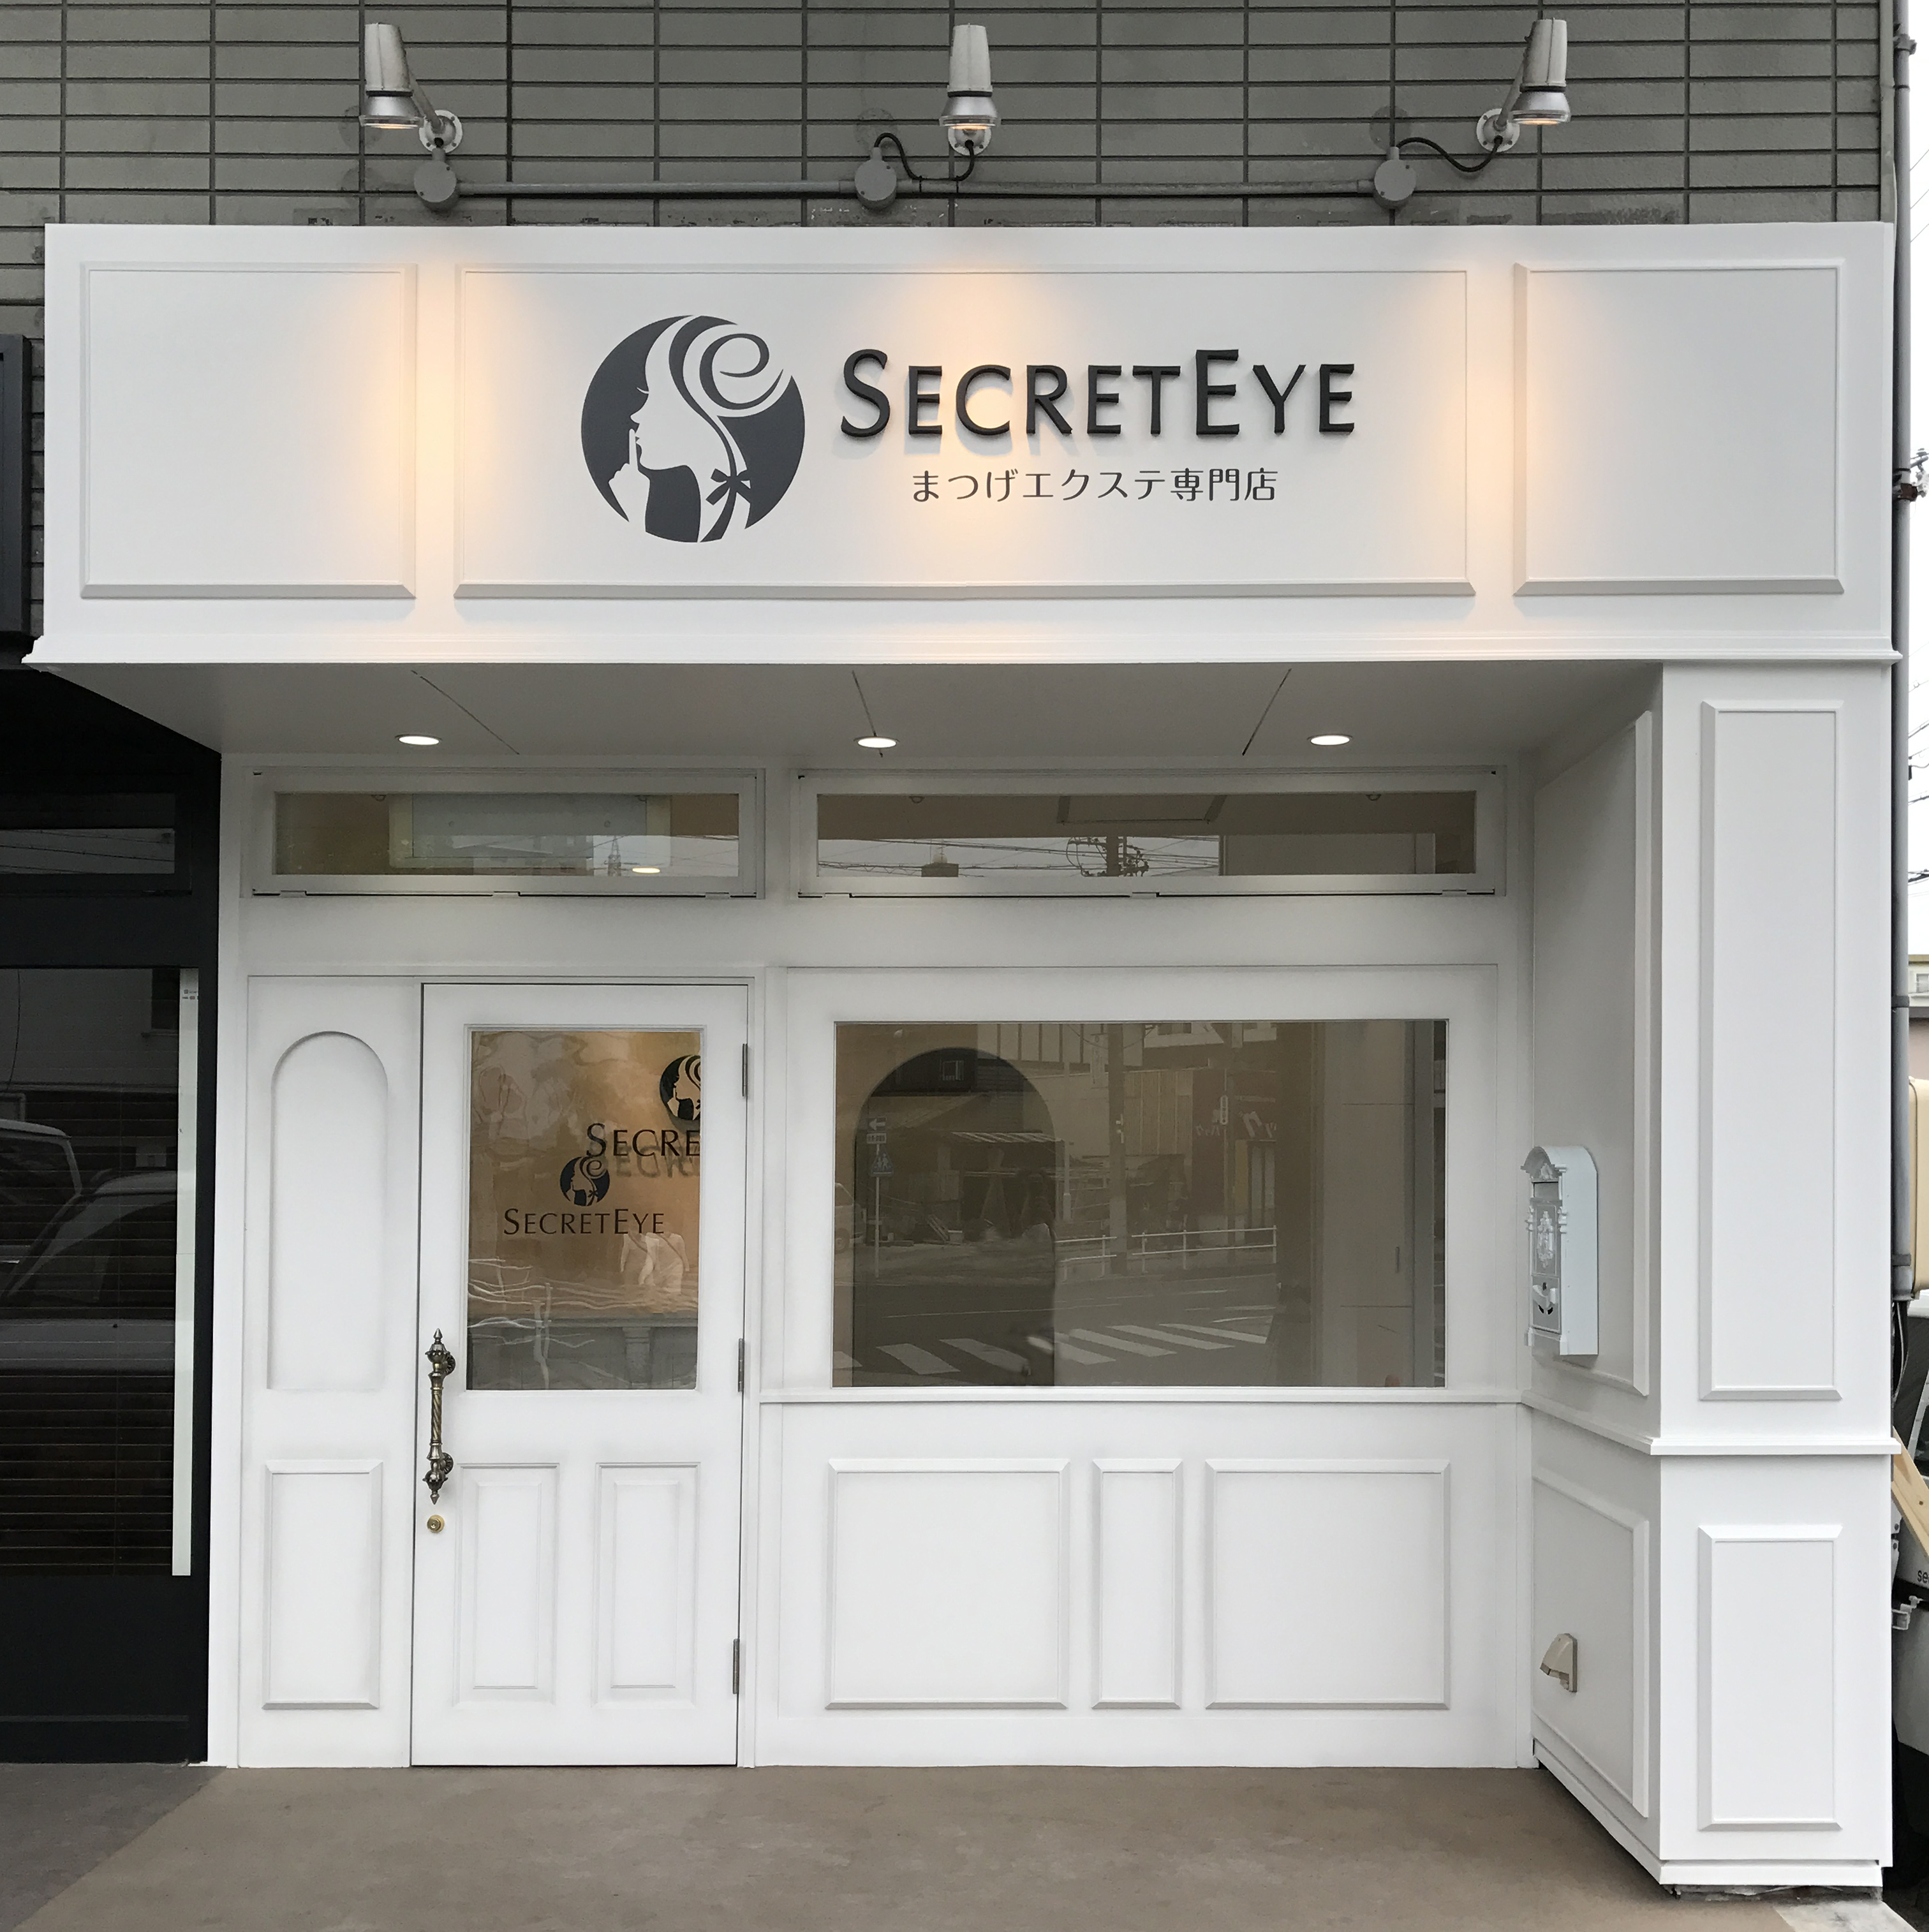 SecretEye front